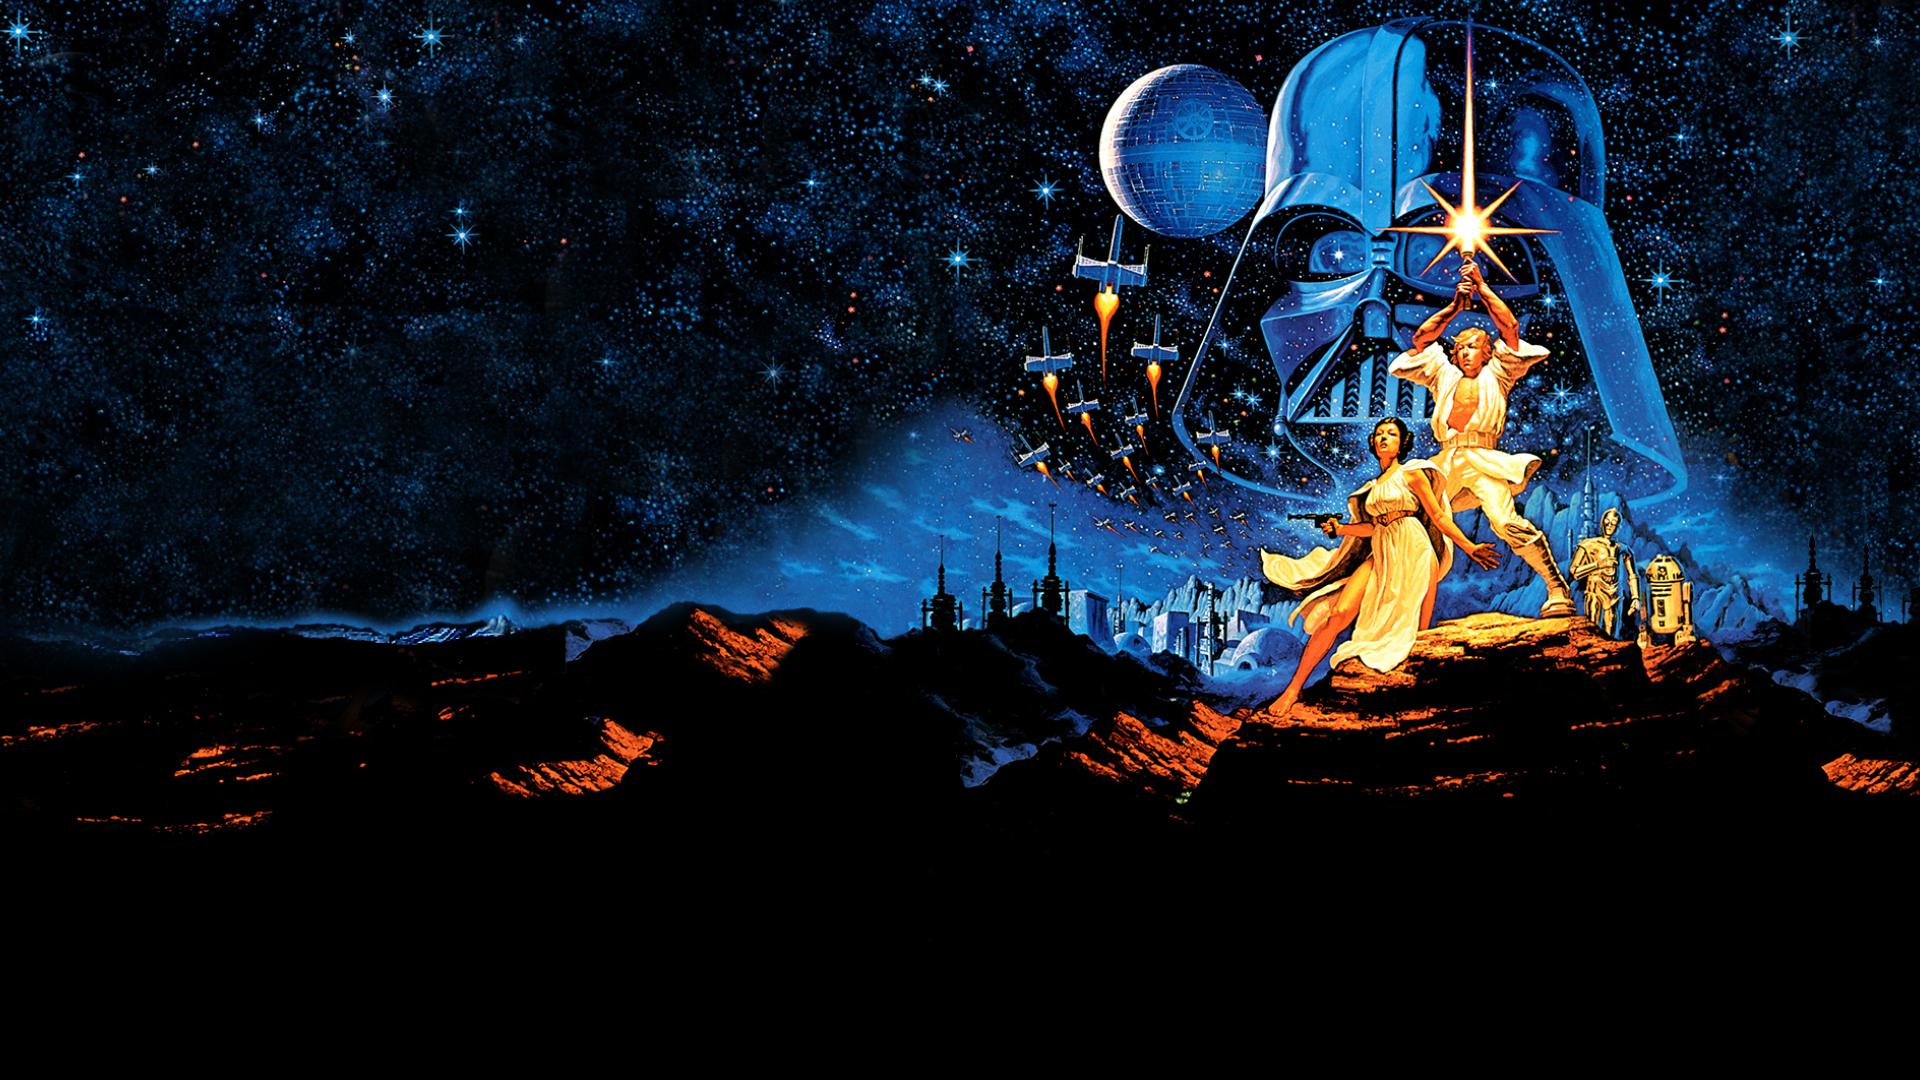 Star-Wars-Wallpaper-31.jpg